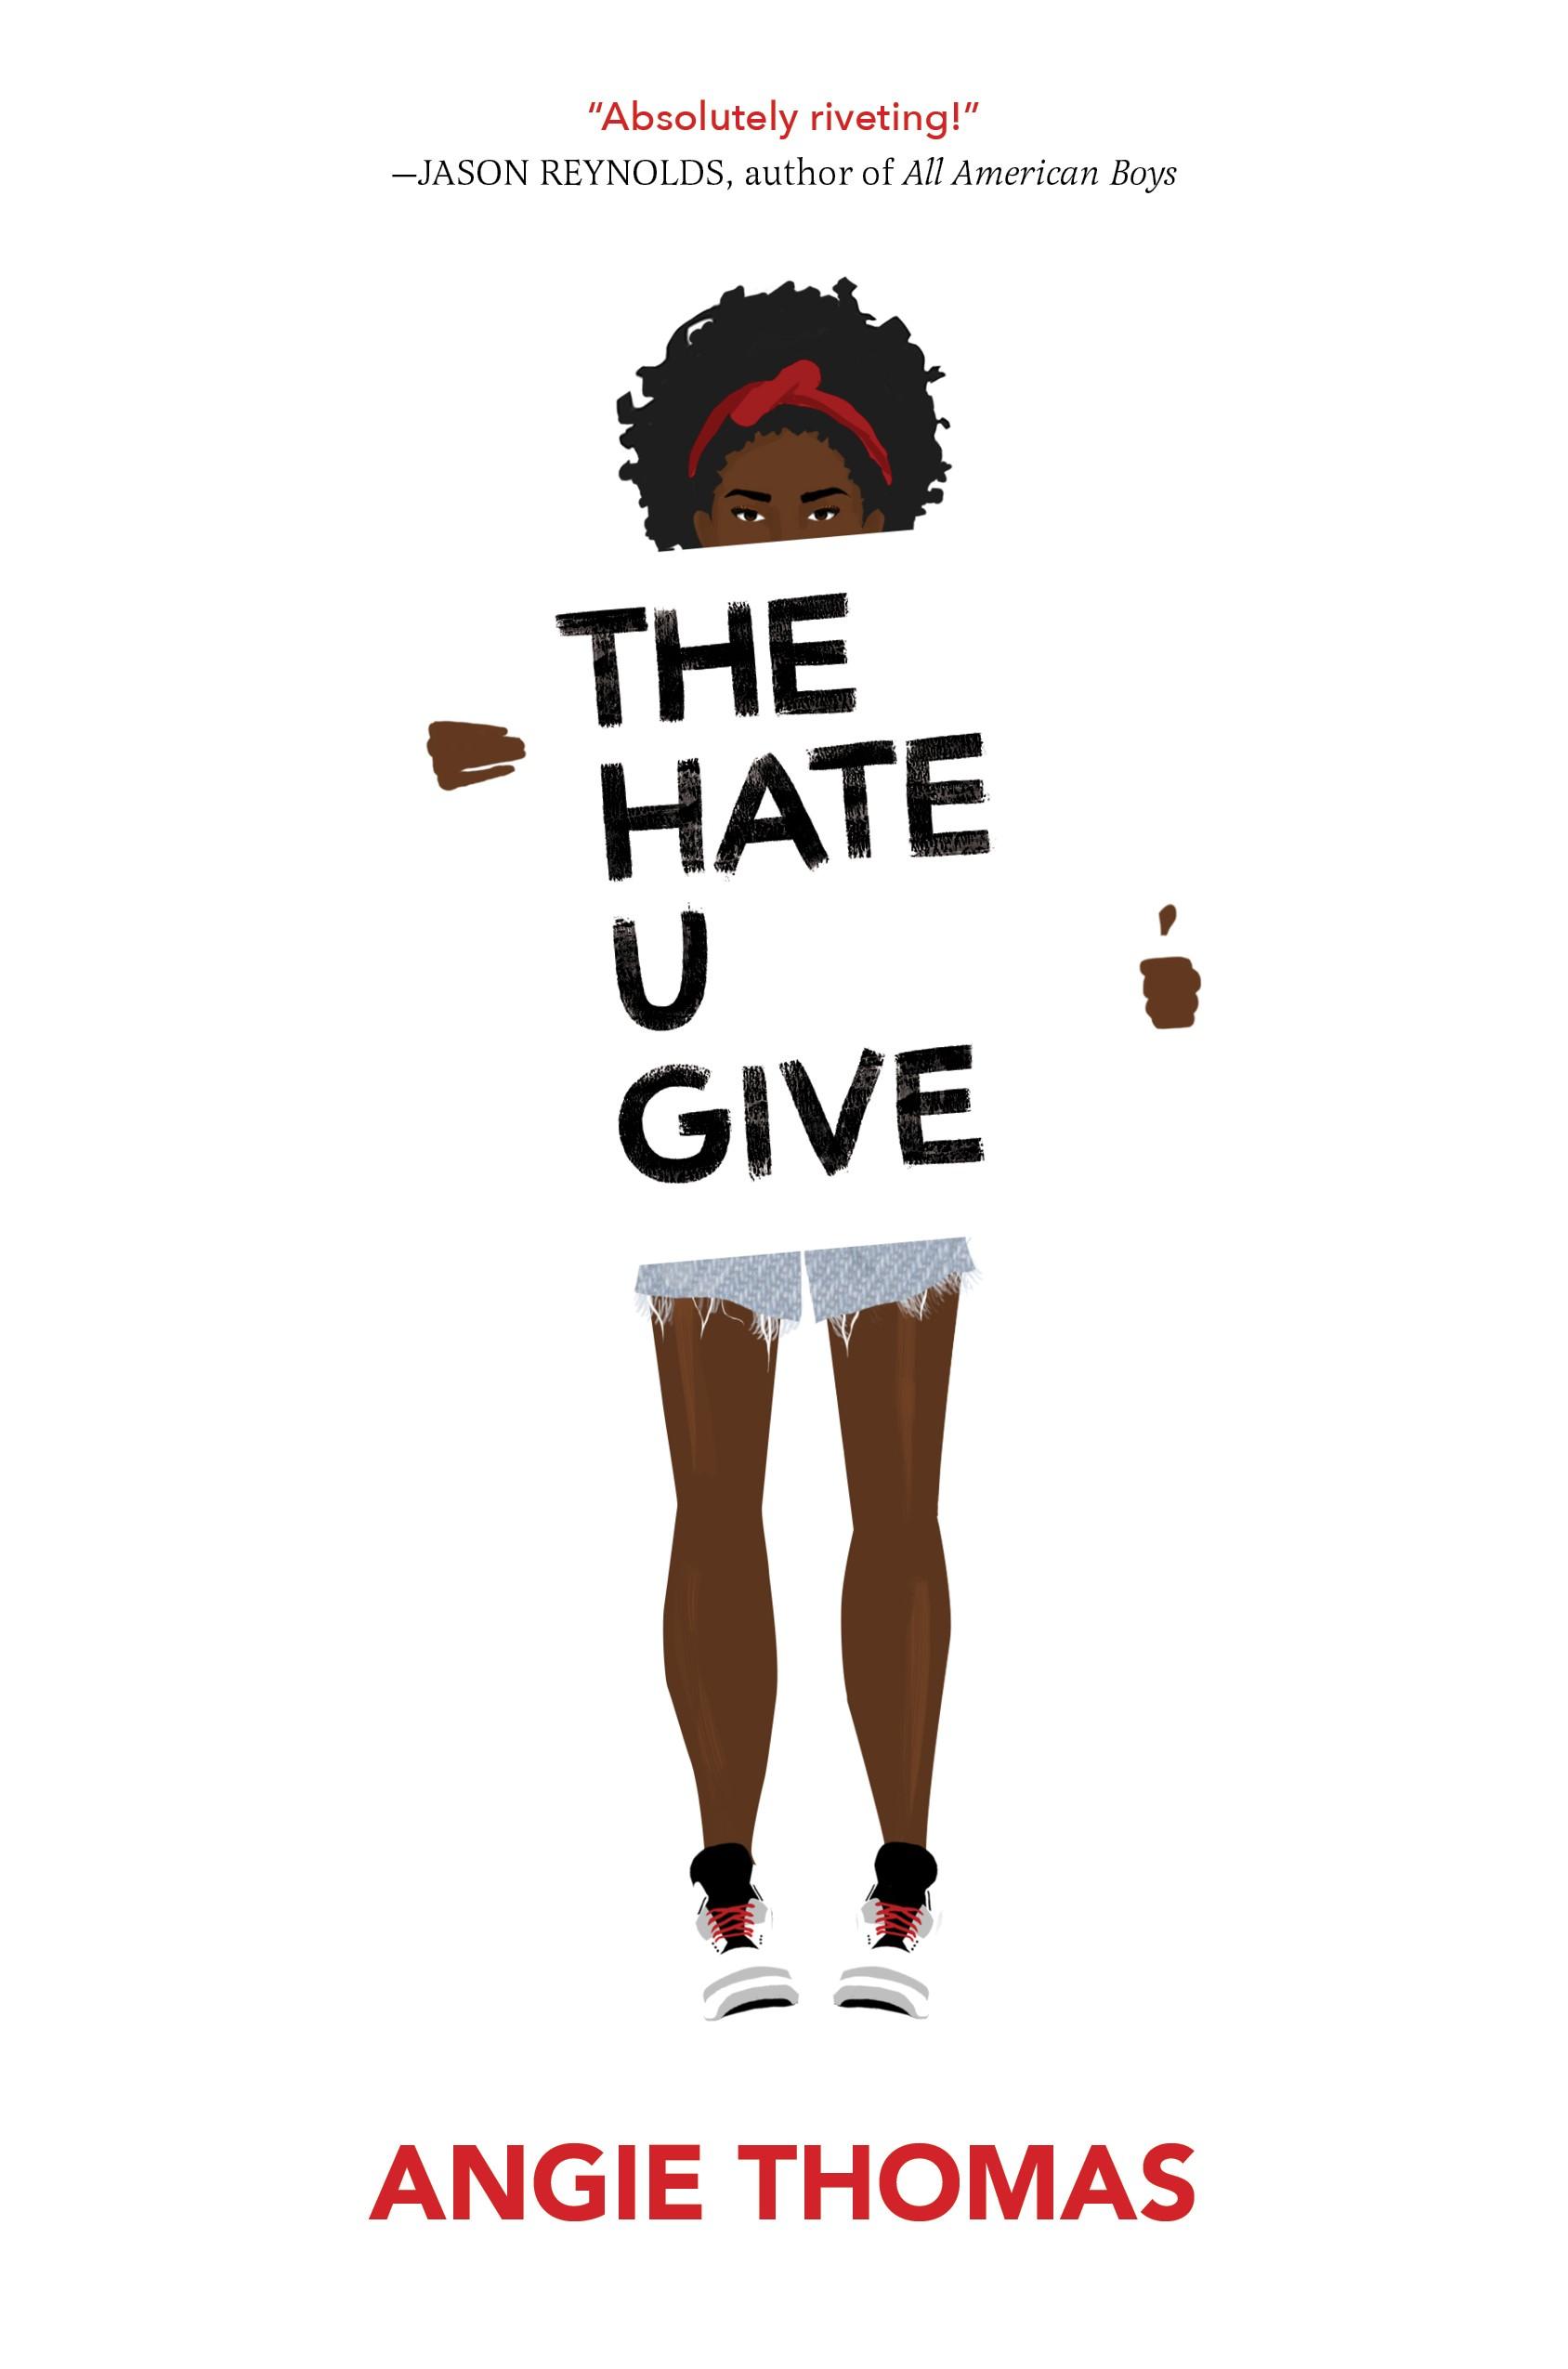 Thomas - THE HATE U GIVE - jacket